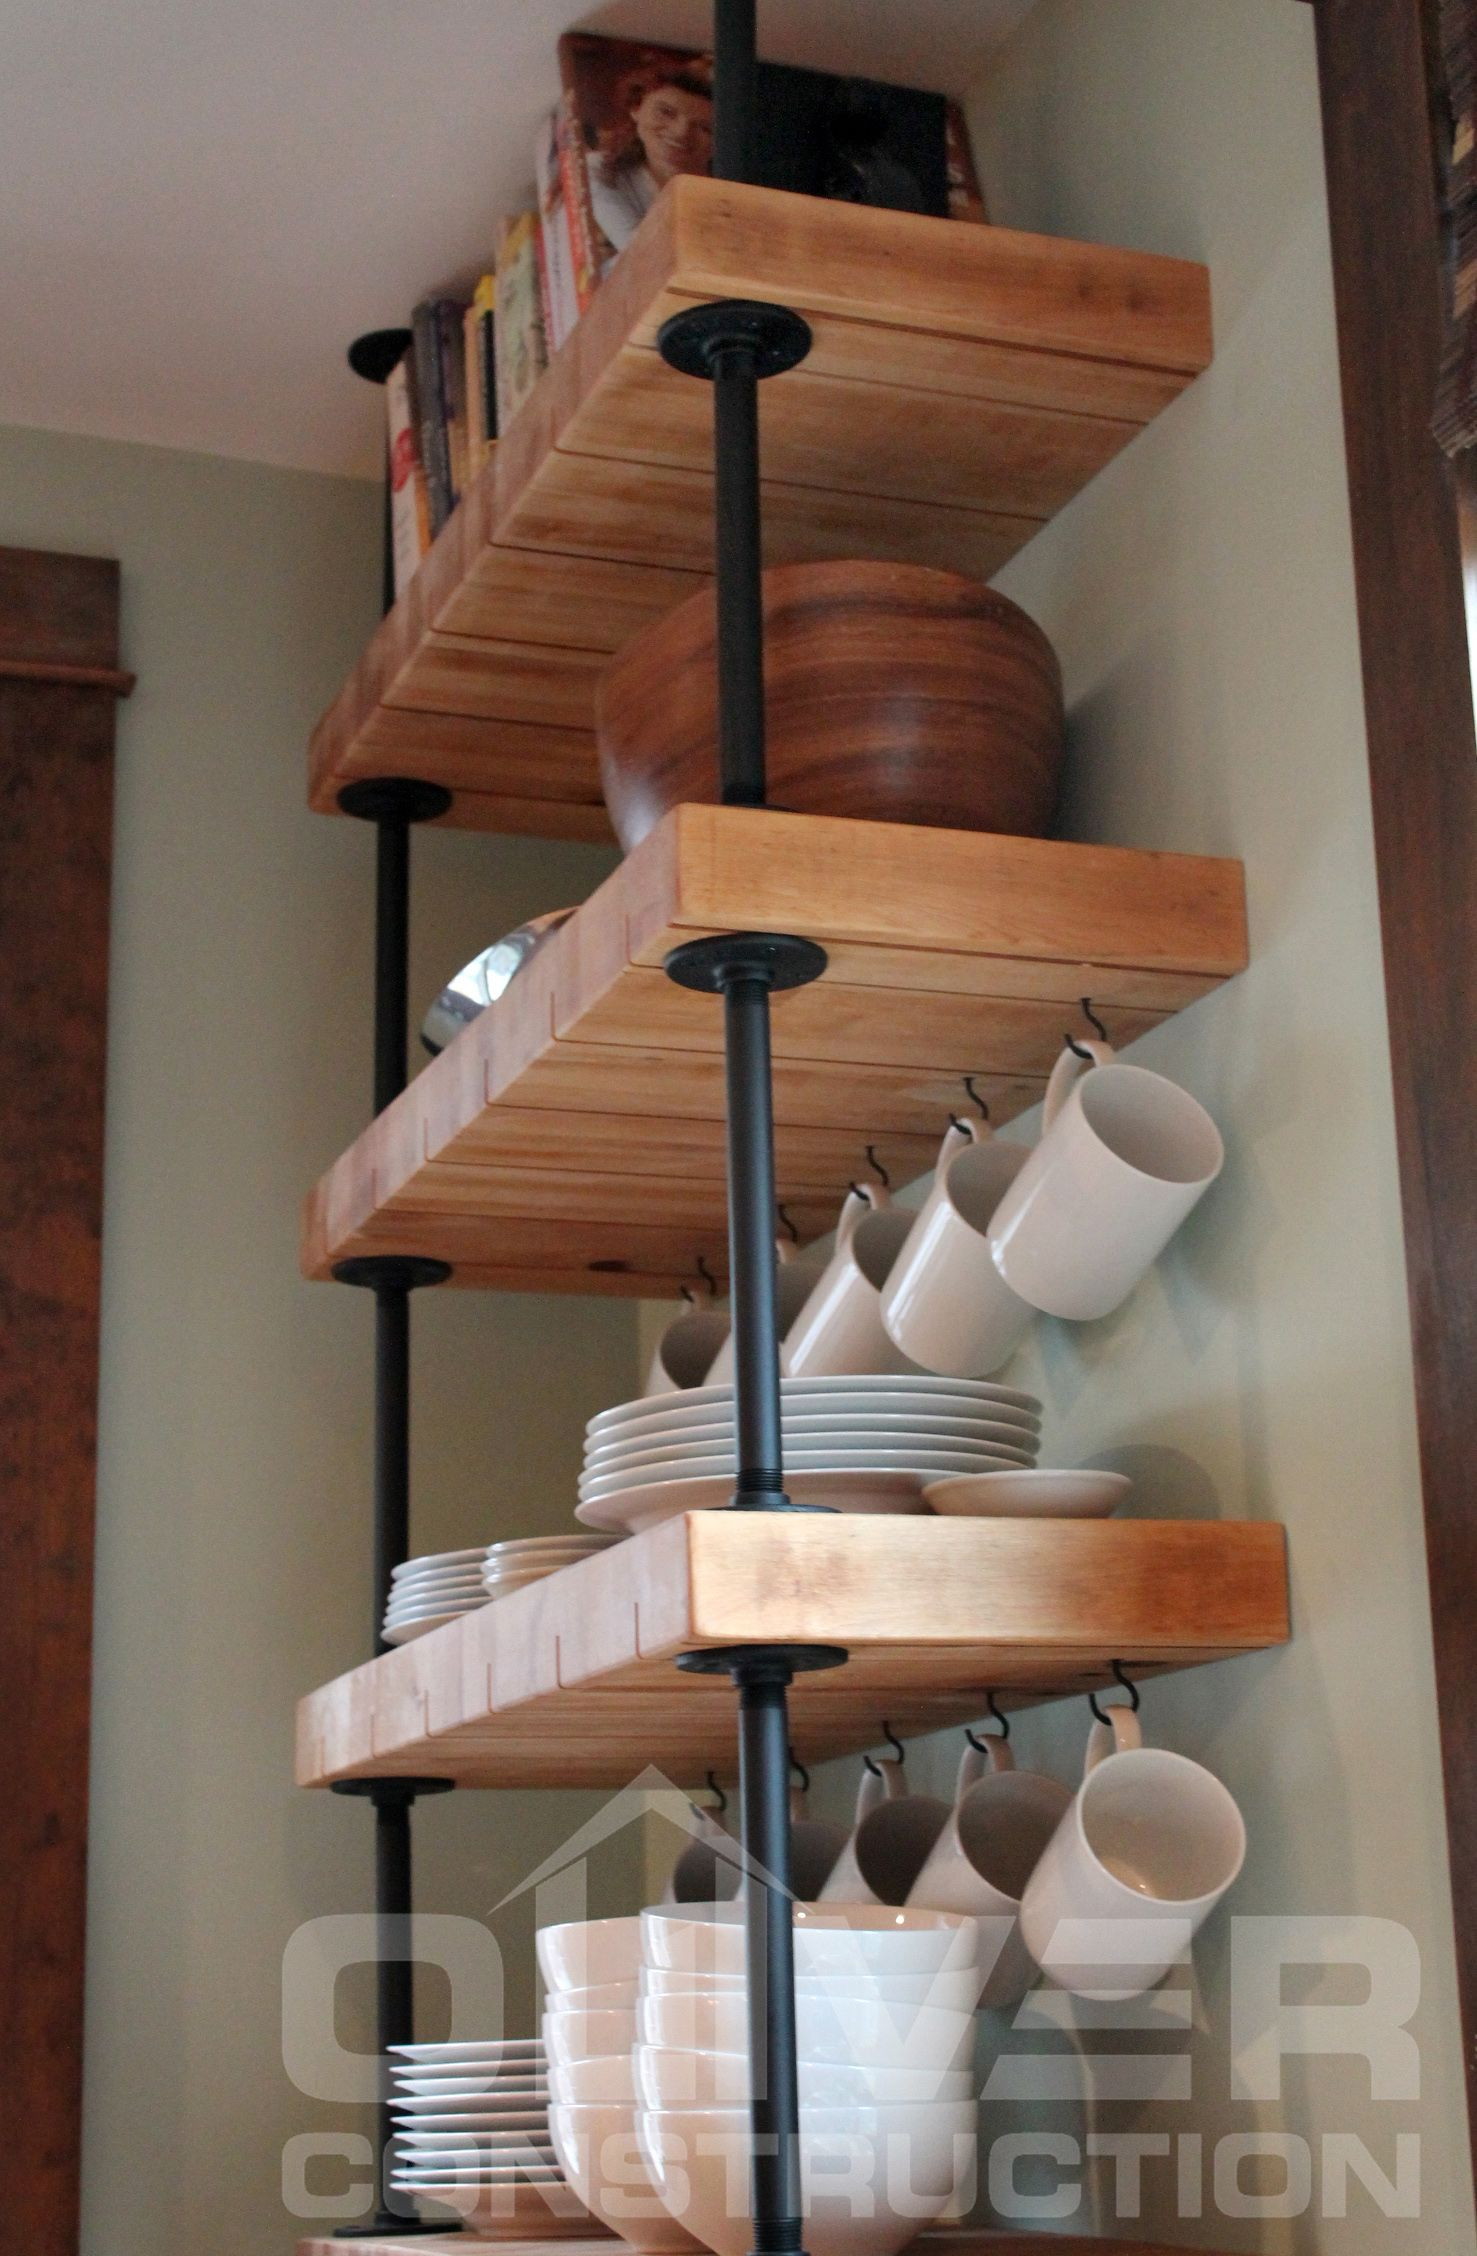 Pin On Kitchens By Oliver Construction Llc Butcher block shelves kitchen